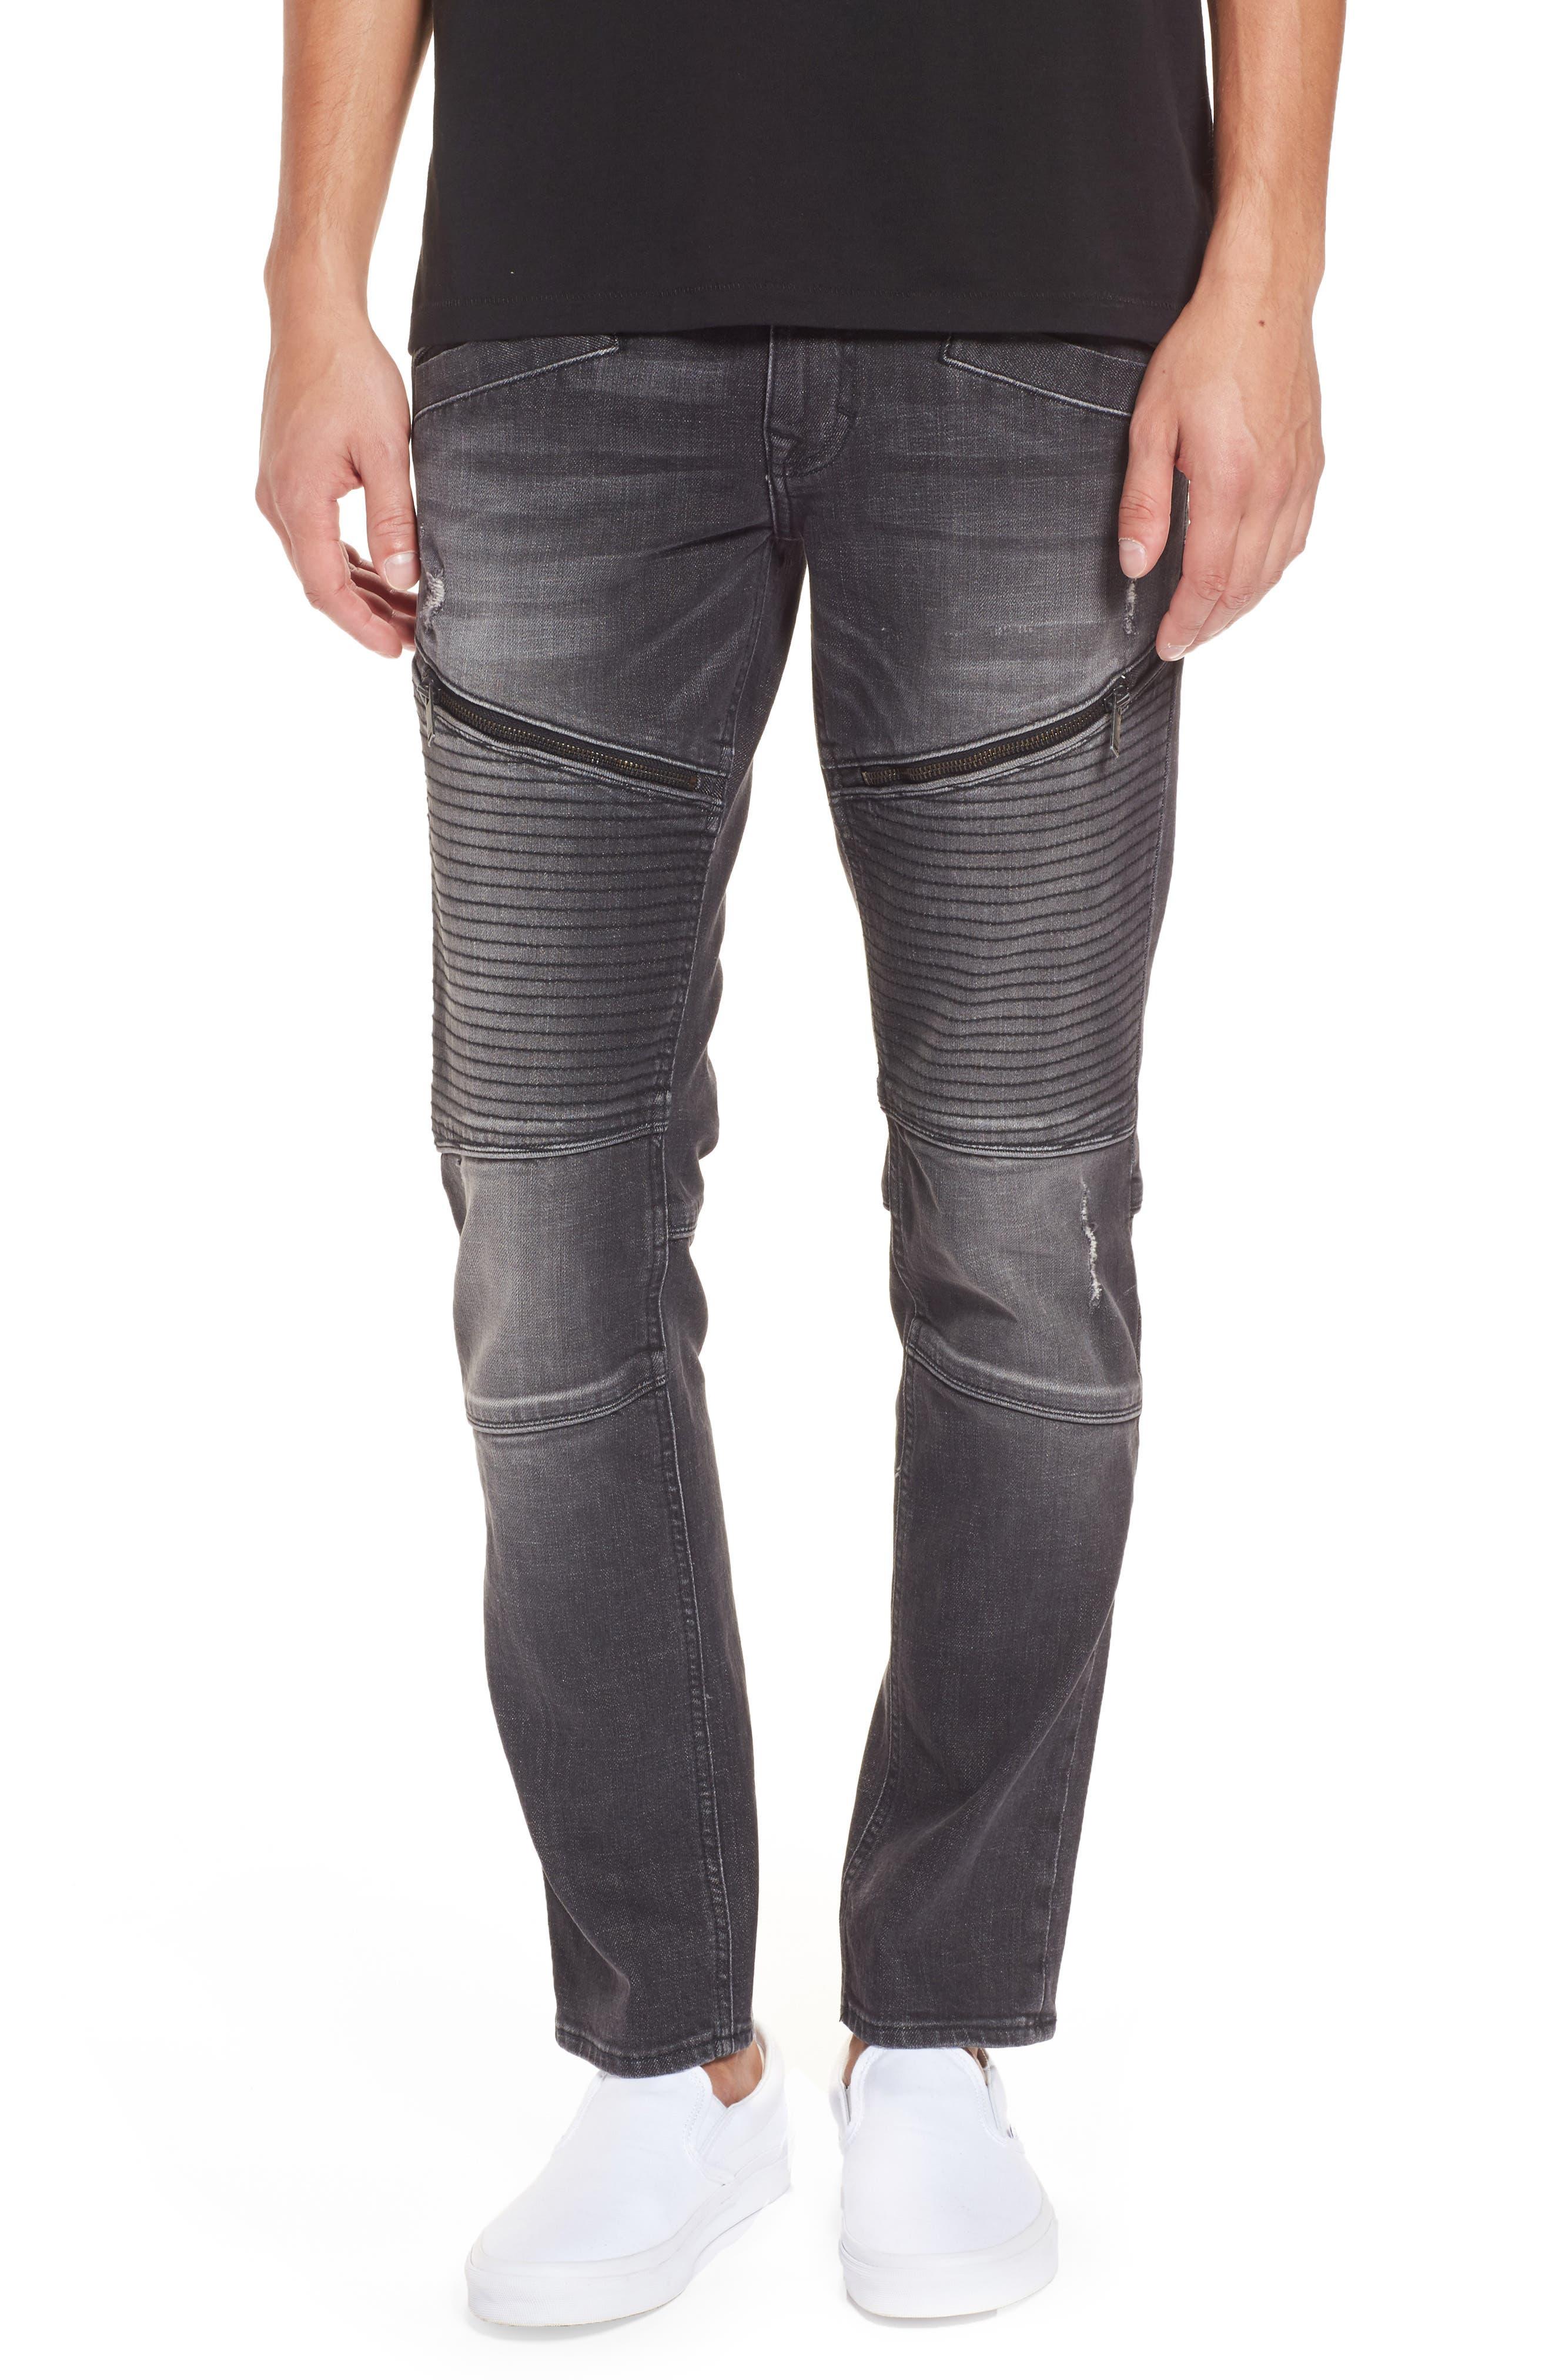 Biker Denim Jeans,                             Main thumbnail 1, color,                             Black